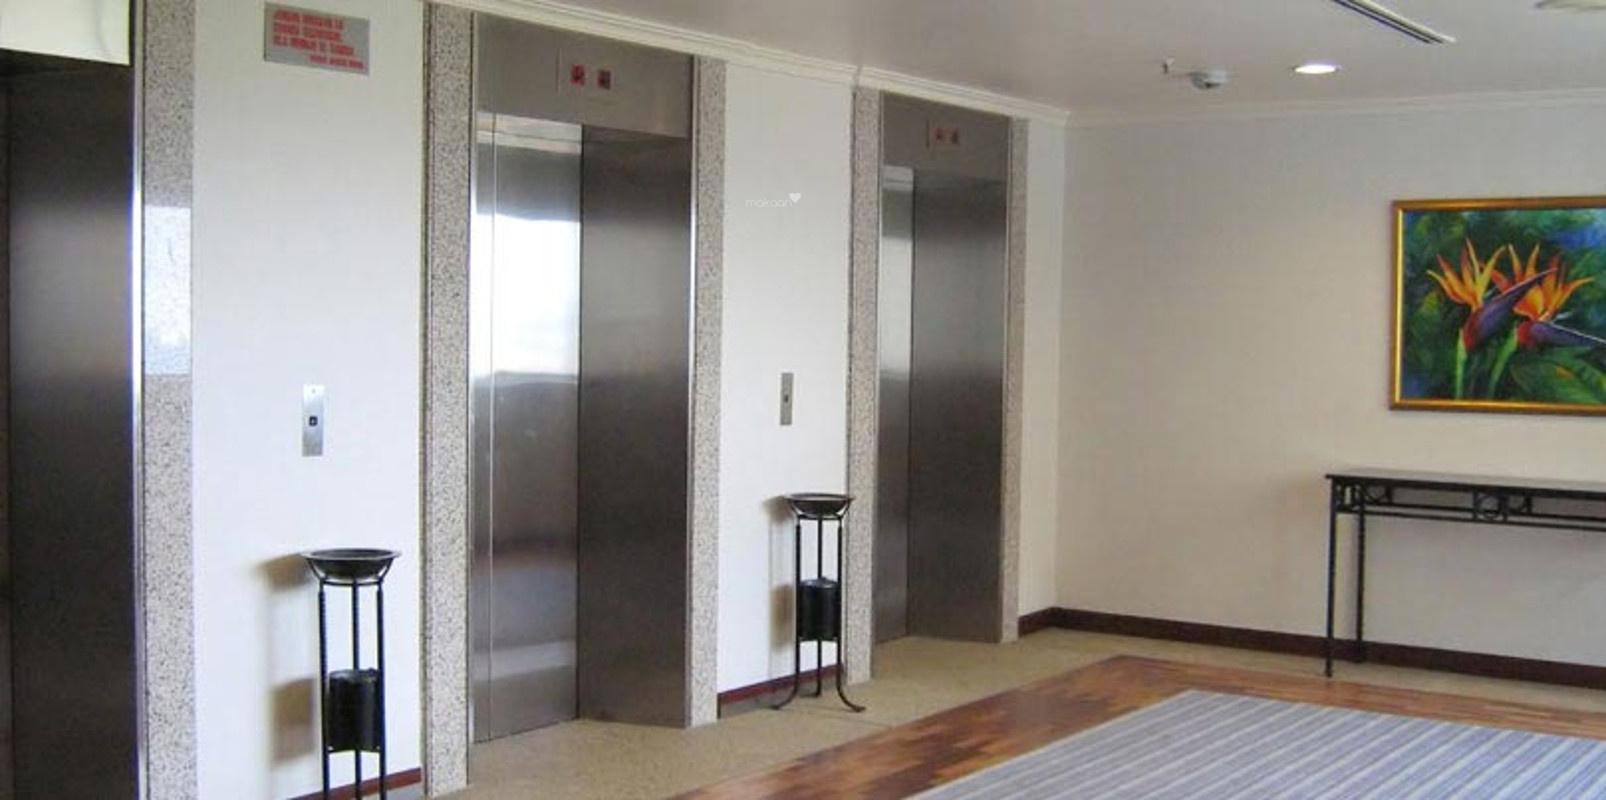 980 sq ft 2BHK 2BHK+2T (980 sq ft) Property By Proptiger In Serenity, Manjari